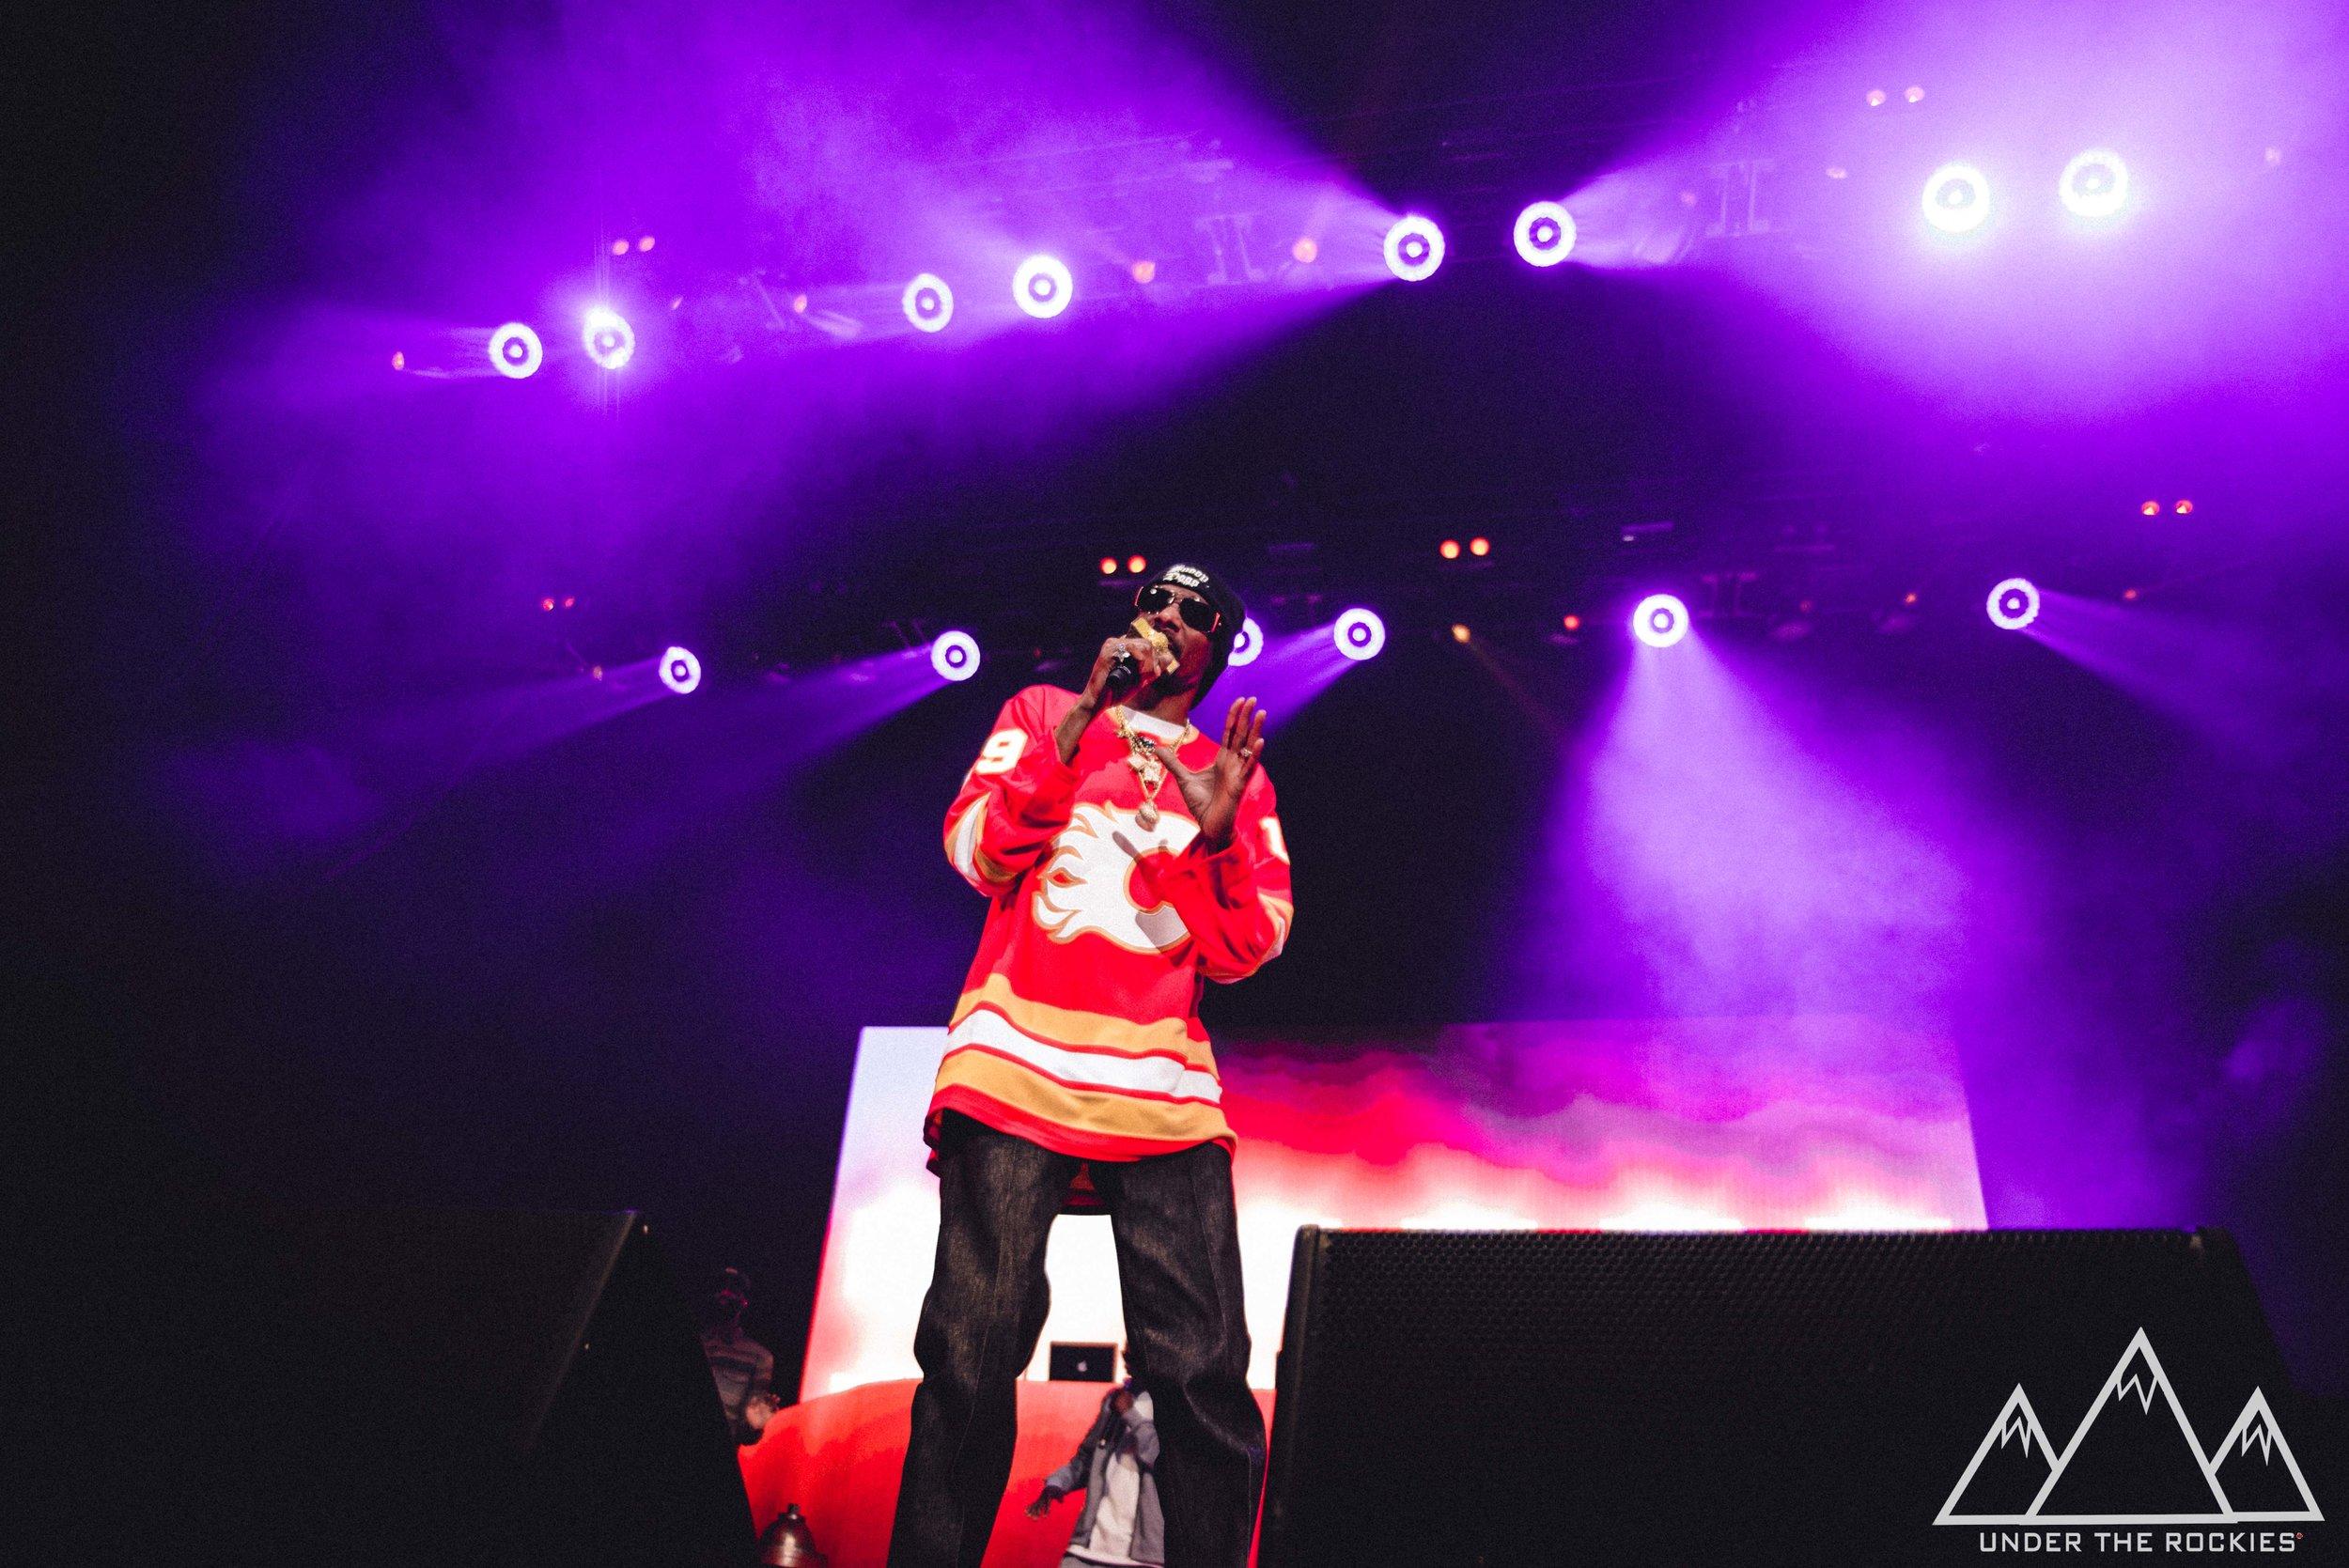 SnoopDogg-11-JJP-20190221.jpg